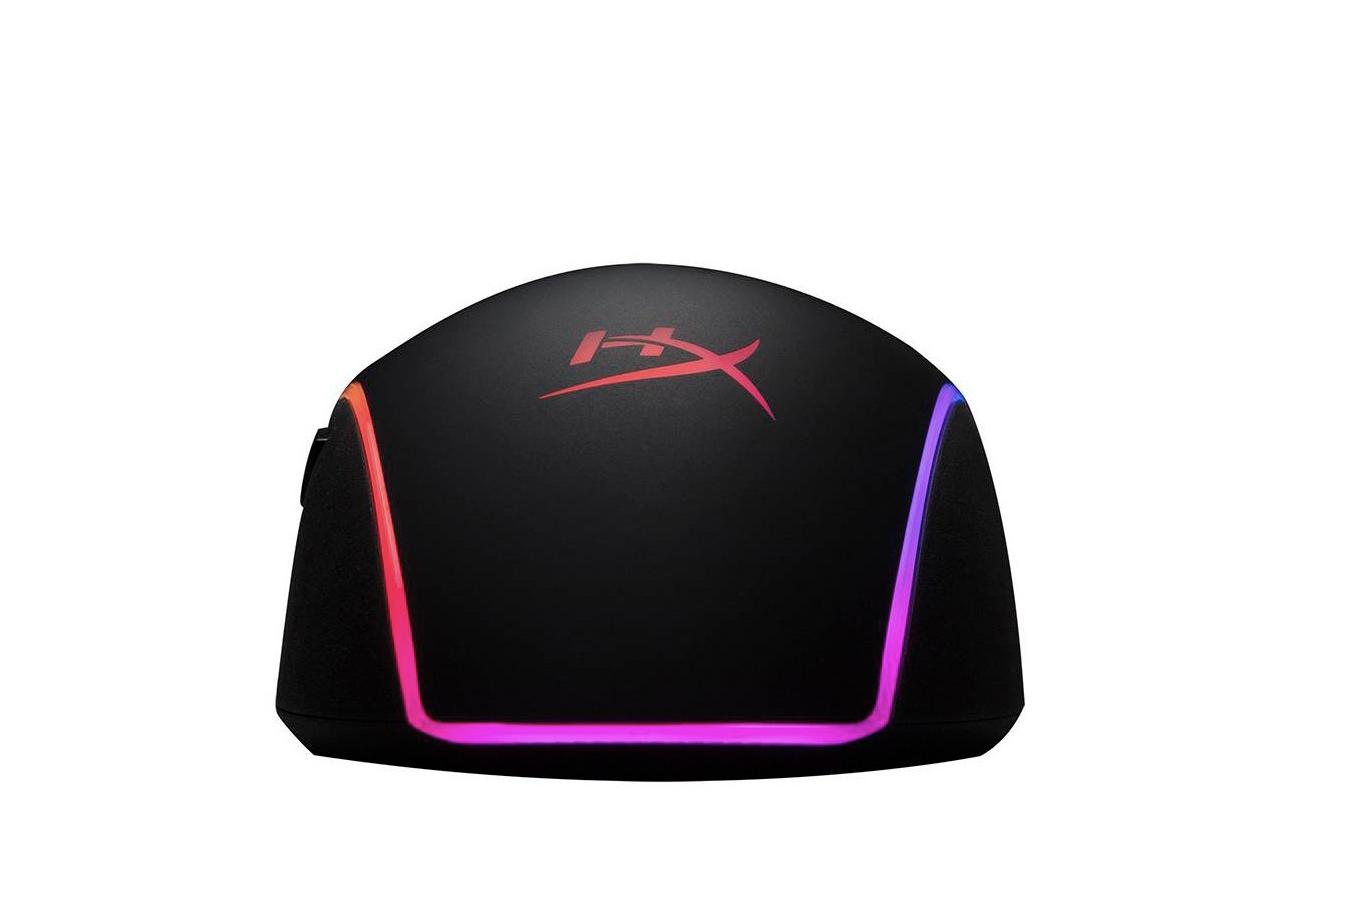 HyperX pulsefire surge RGB culturageek.com.ar